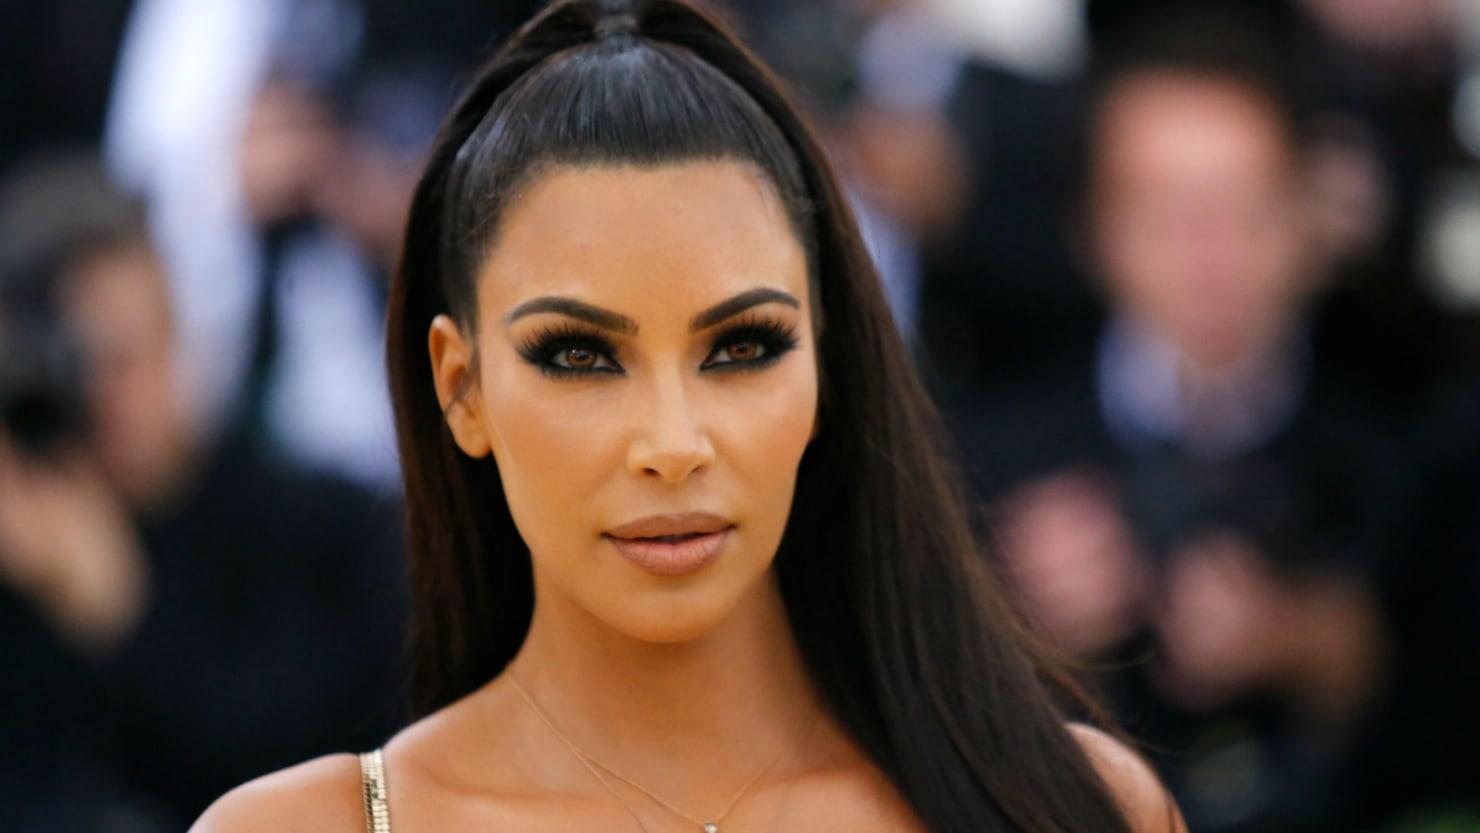 Here We Go: Kim Kardashian Is Releasing Her First OfficialLipstick